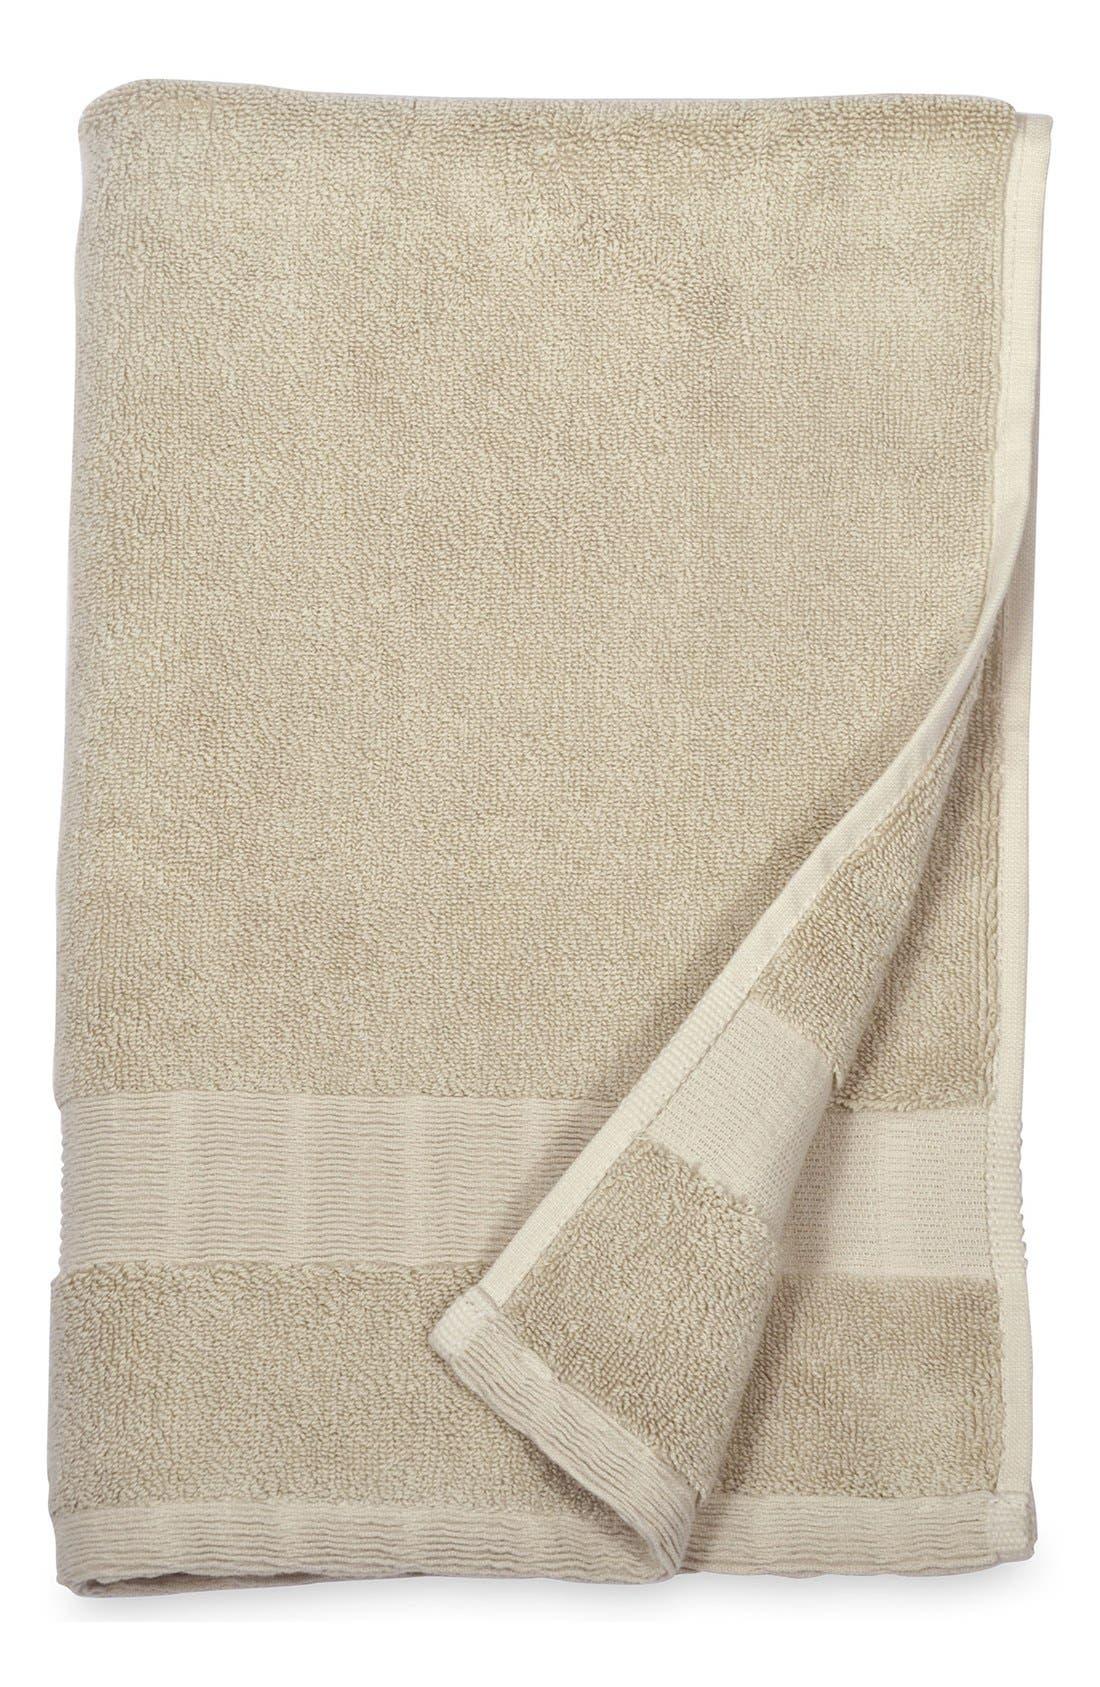 Mercer Hand Towel,                             Main thumbnail 1, color,                             STONE